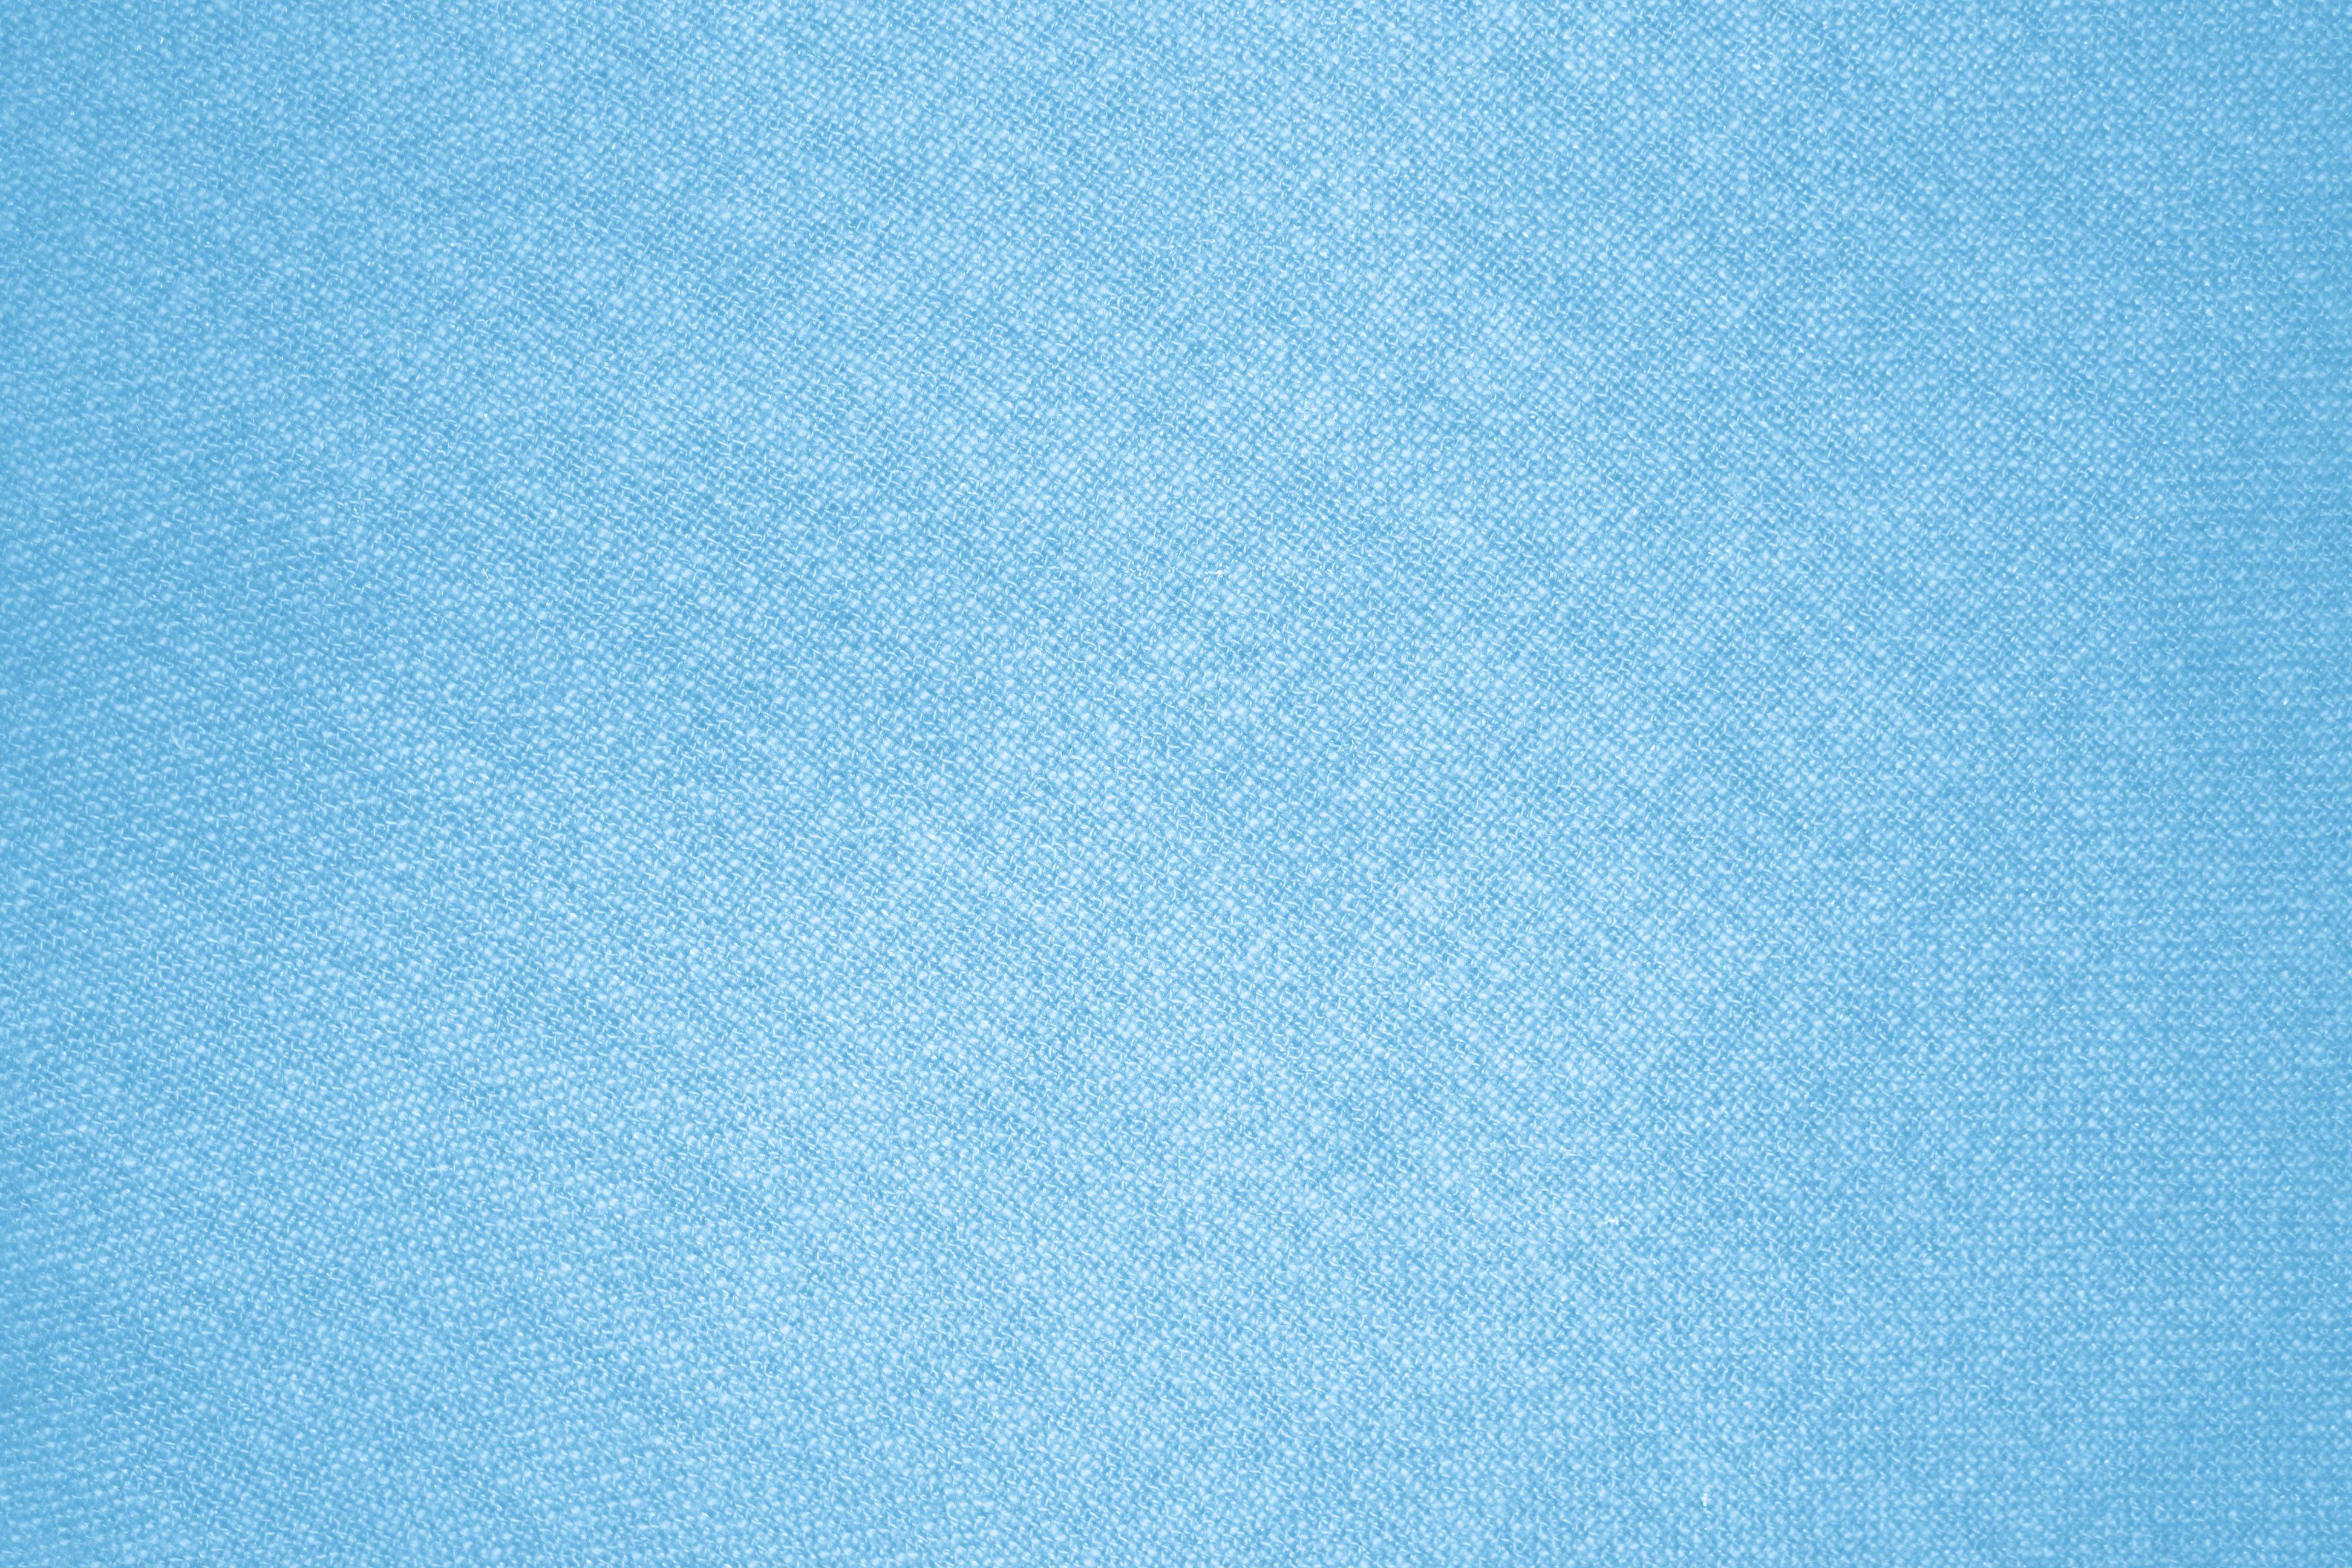 blue scratched texture wallpaper - photo #12